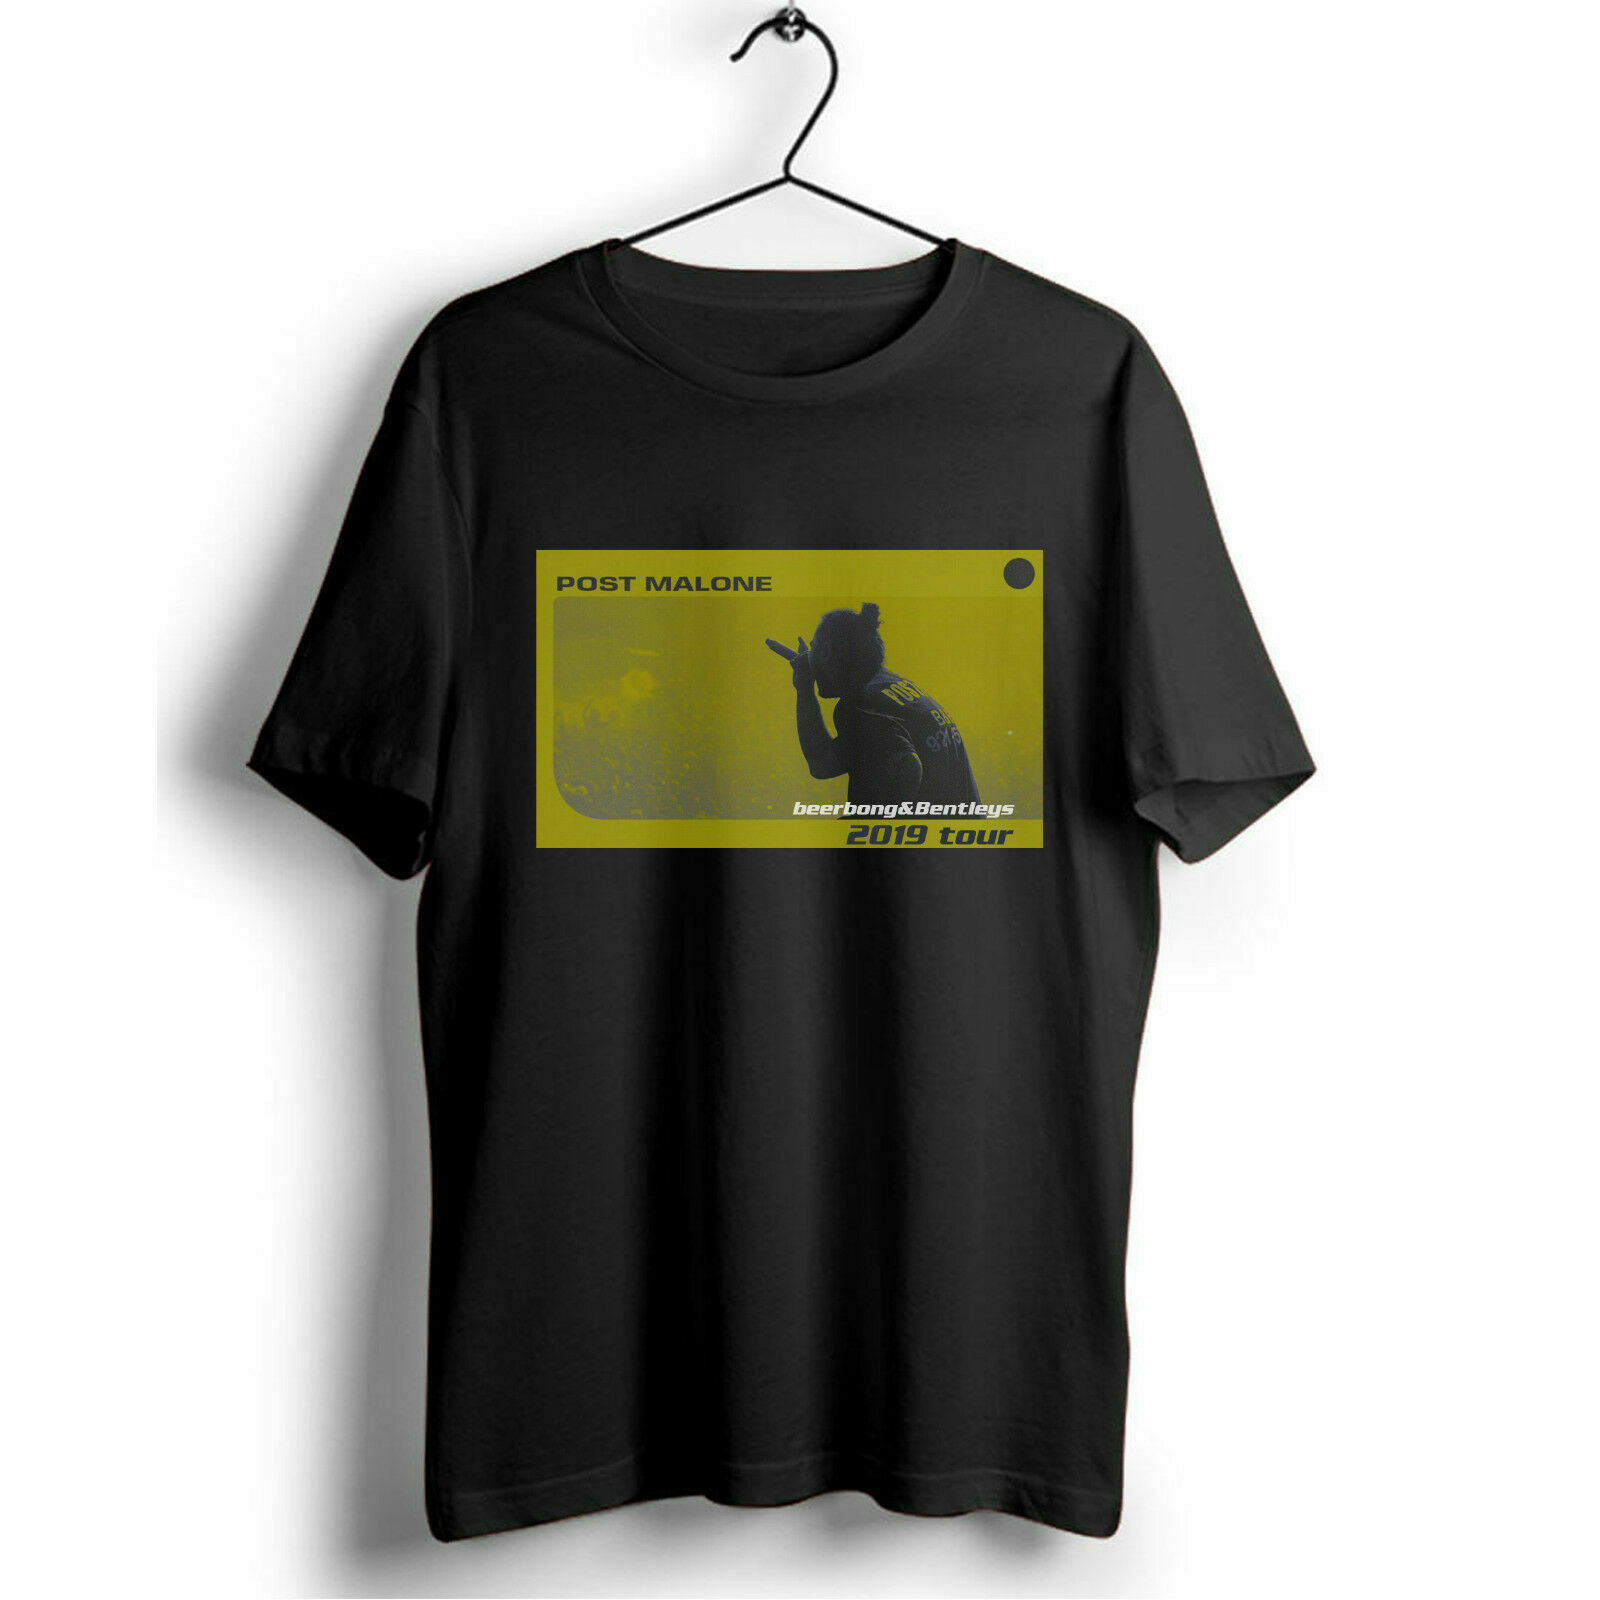 08be48830d6b POST MALONE Beerbongs y Bentleys 2019 Tour Hip Hop Rap Camiseta de manga  corta de algodón tee top - a.dupa.me